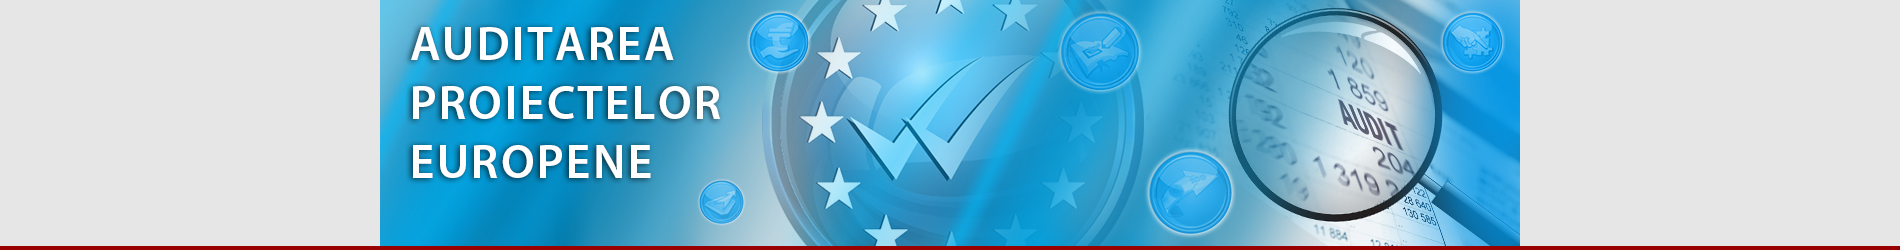 banner_site_auditarea proiectelor europene